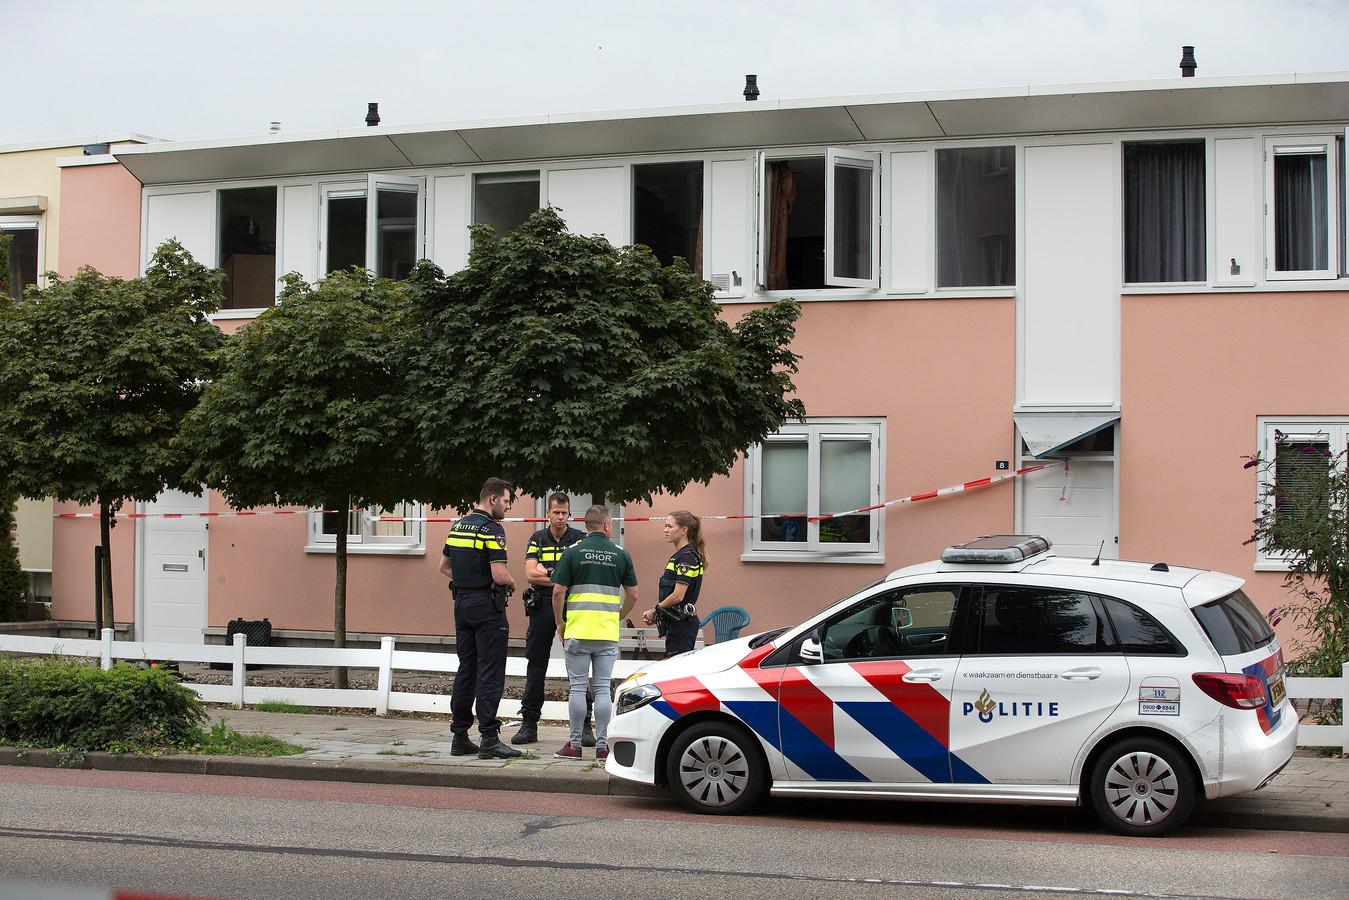 Hulpverleners bij het huis aan de Monseigneur Bekkerlaan in Doesburg, woensdag.